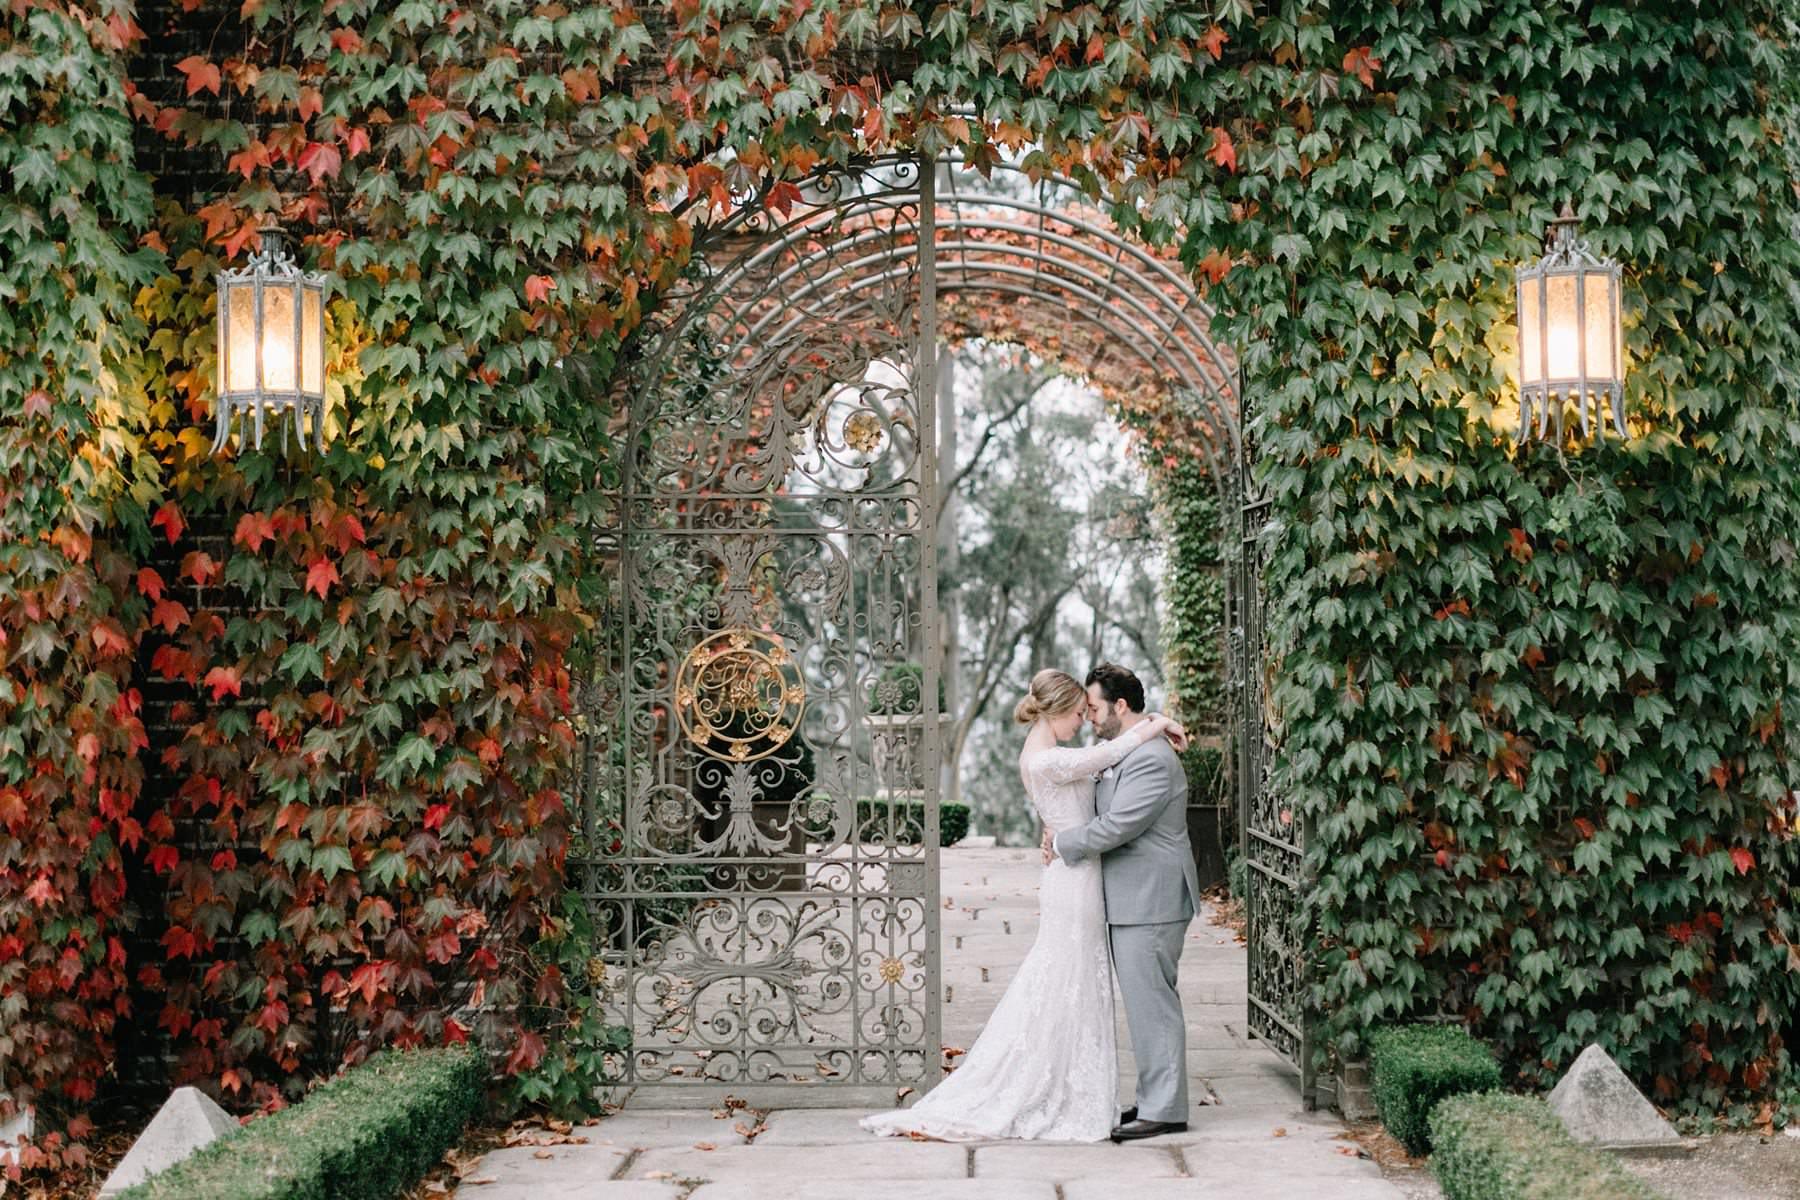 Milton Park wedding photo in autumn